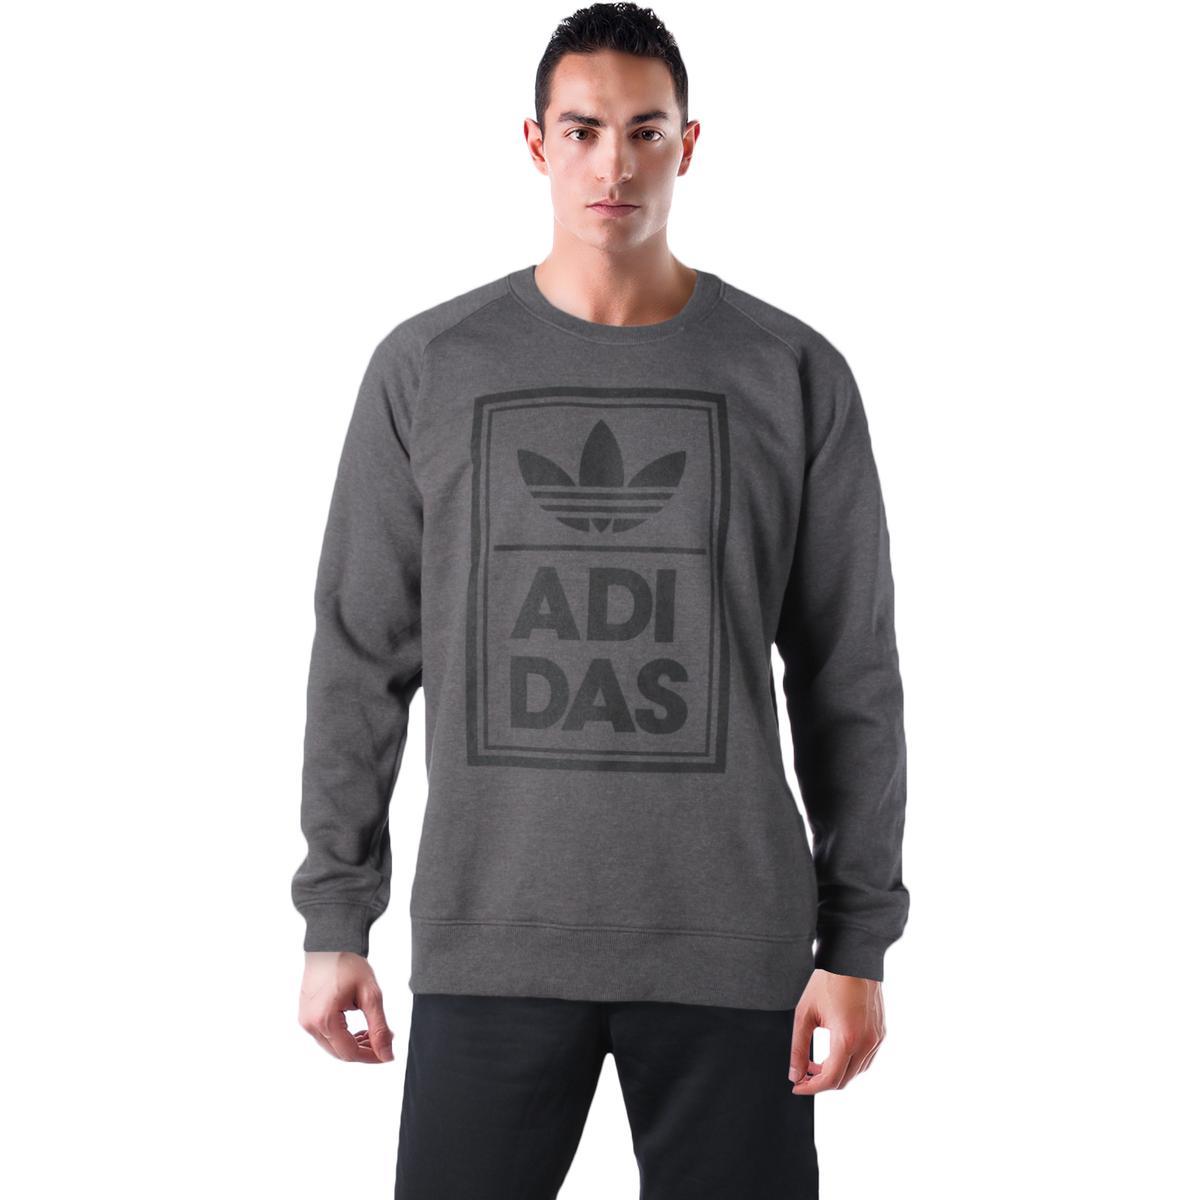 ebay adidas bandana hoodie